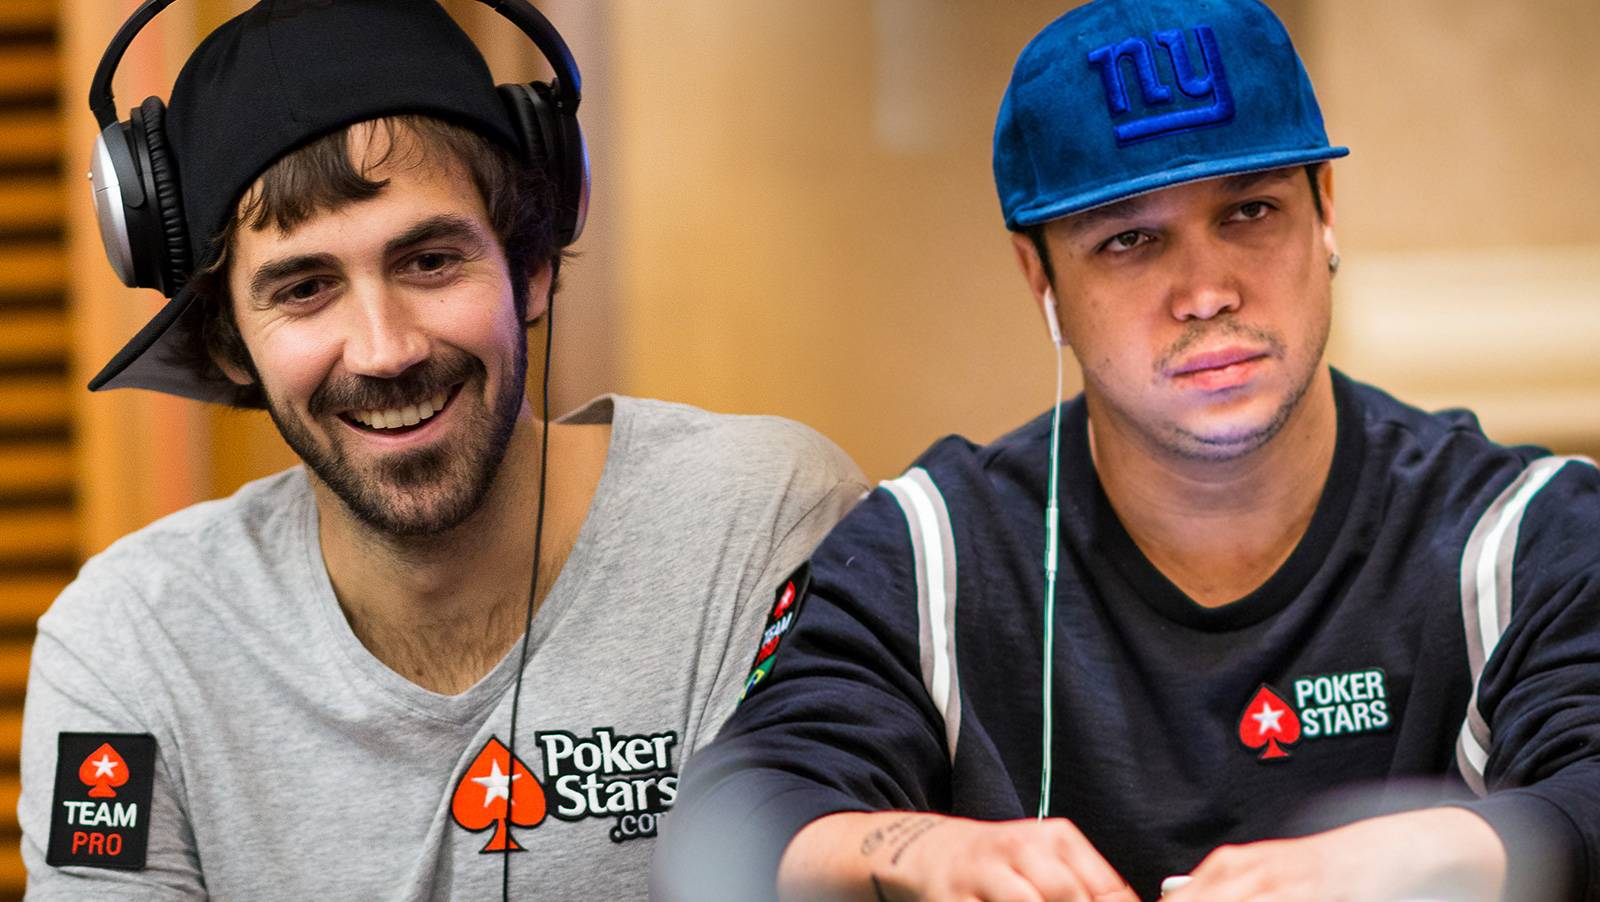 Mercier & Ramos follow Selbst out of the door marked 'PokerStars'